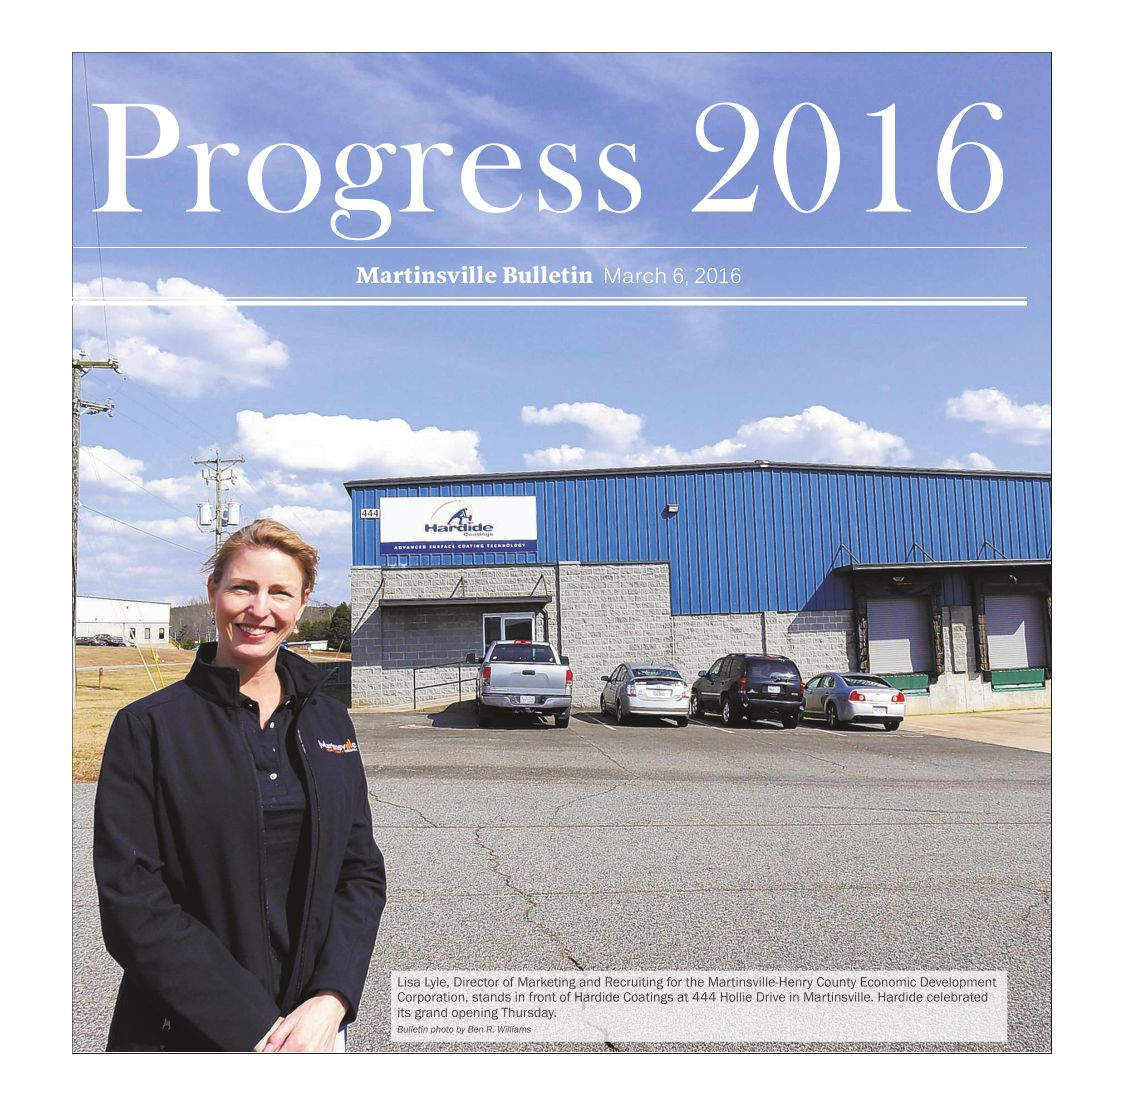 Progress 2016